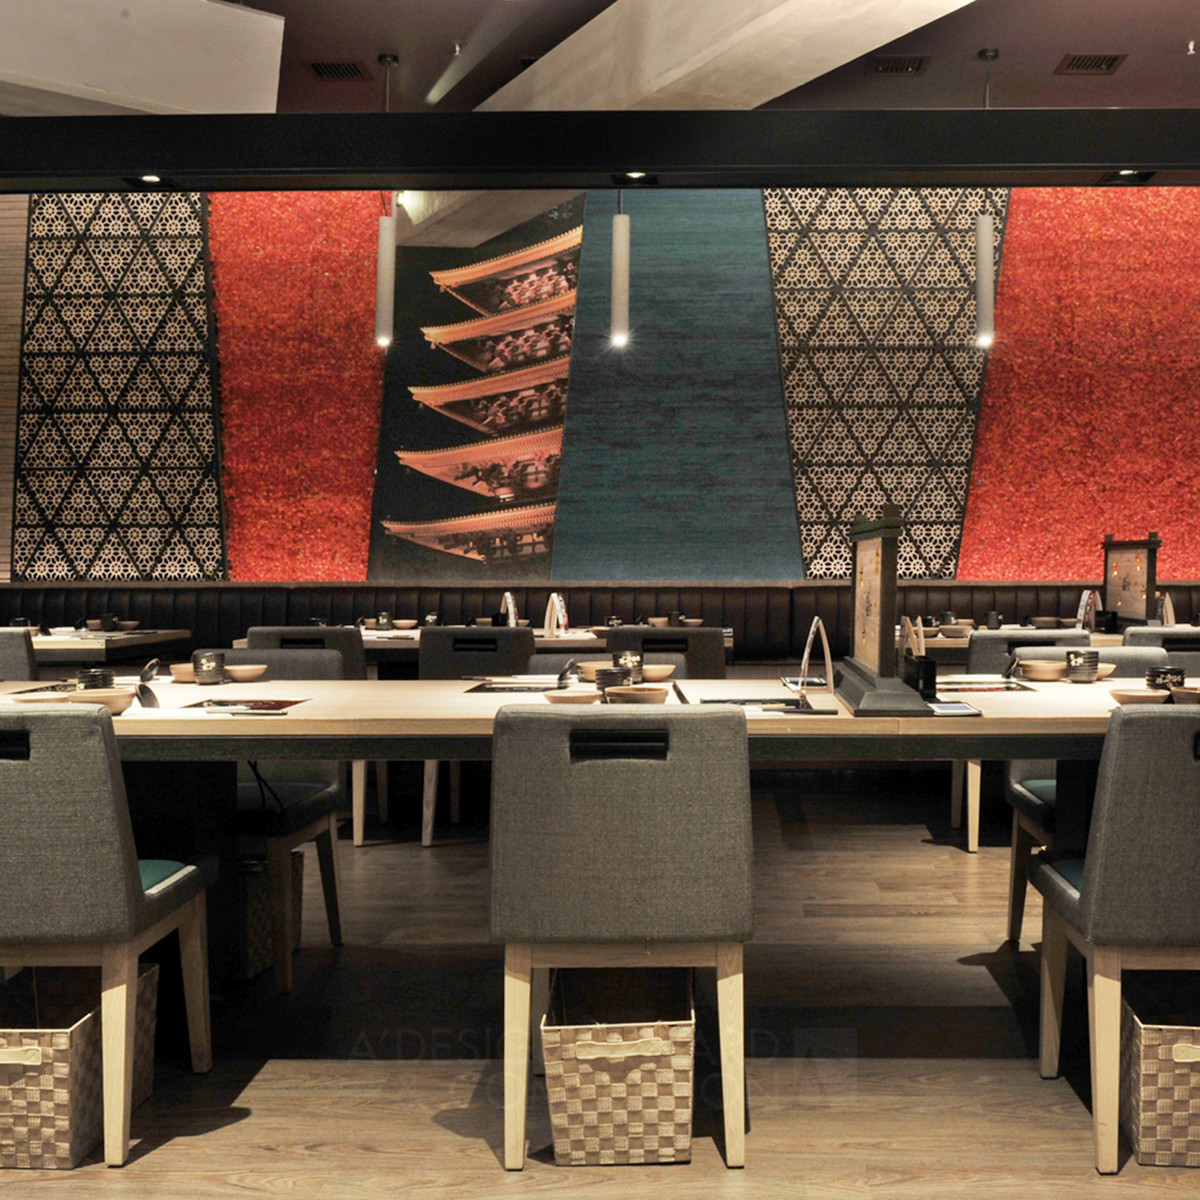 Onyasai FestivalWalk Restaurant